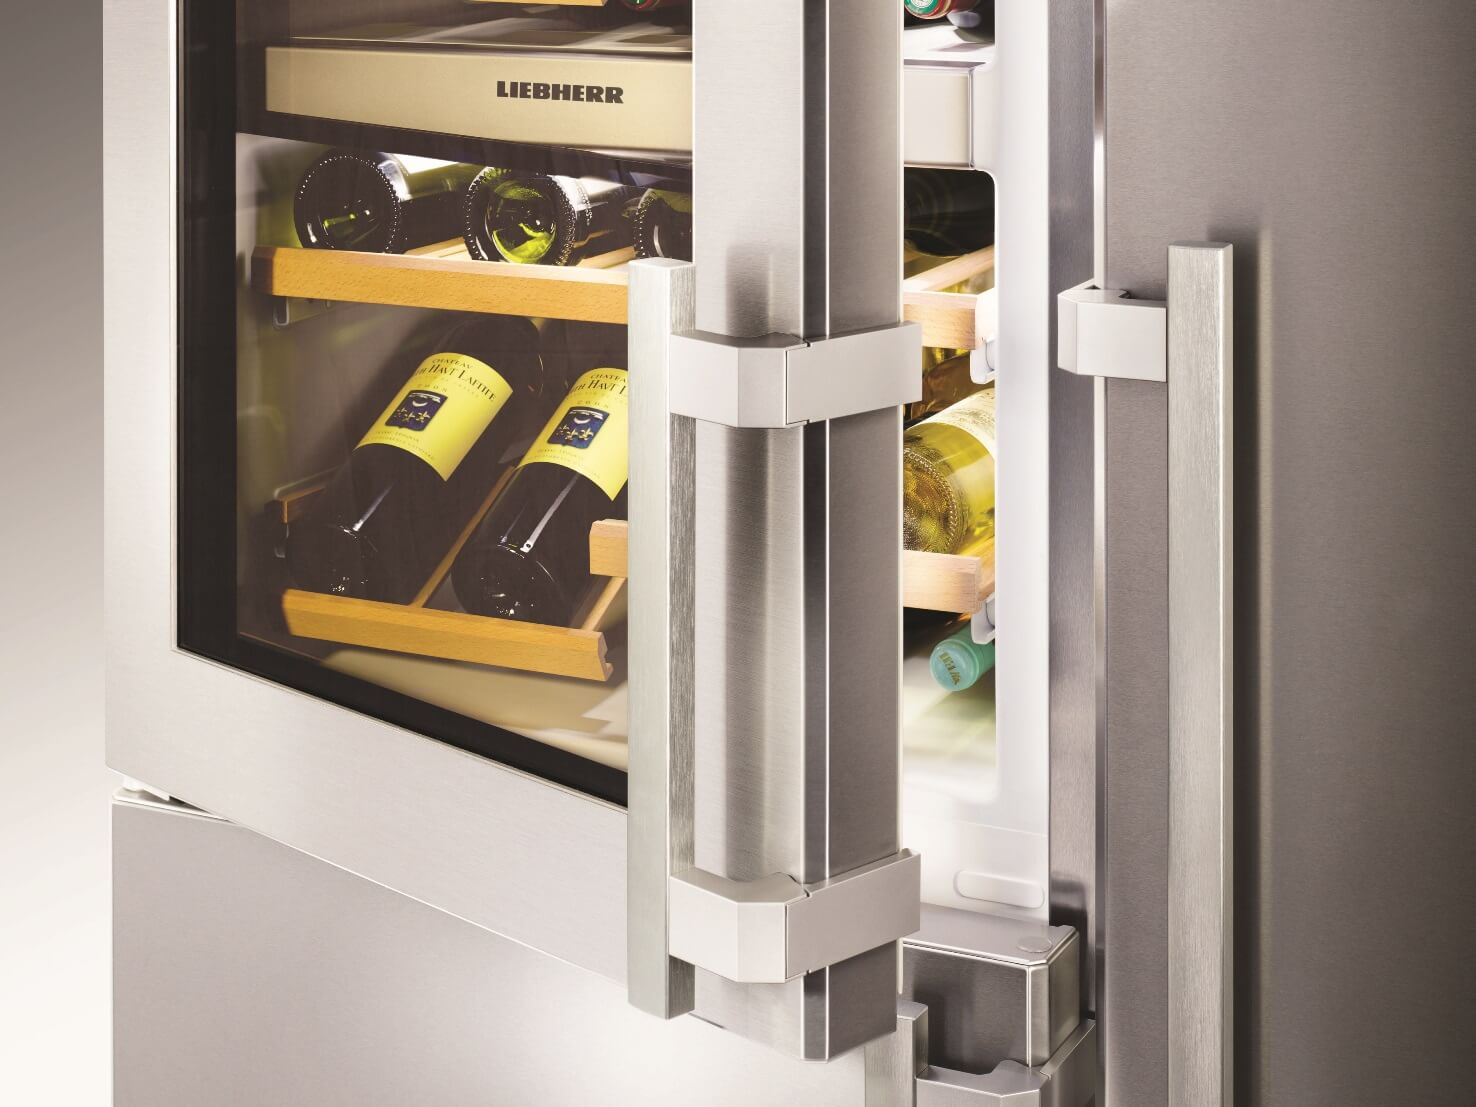 купить Side-by-Side холодильник Liebherr SBSes 8486 Украина фото 13